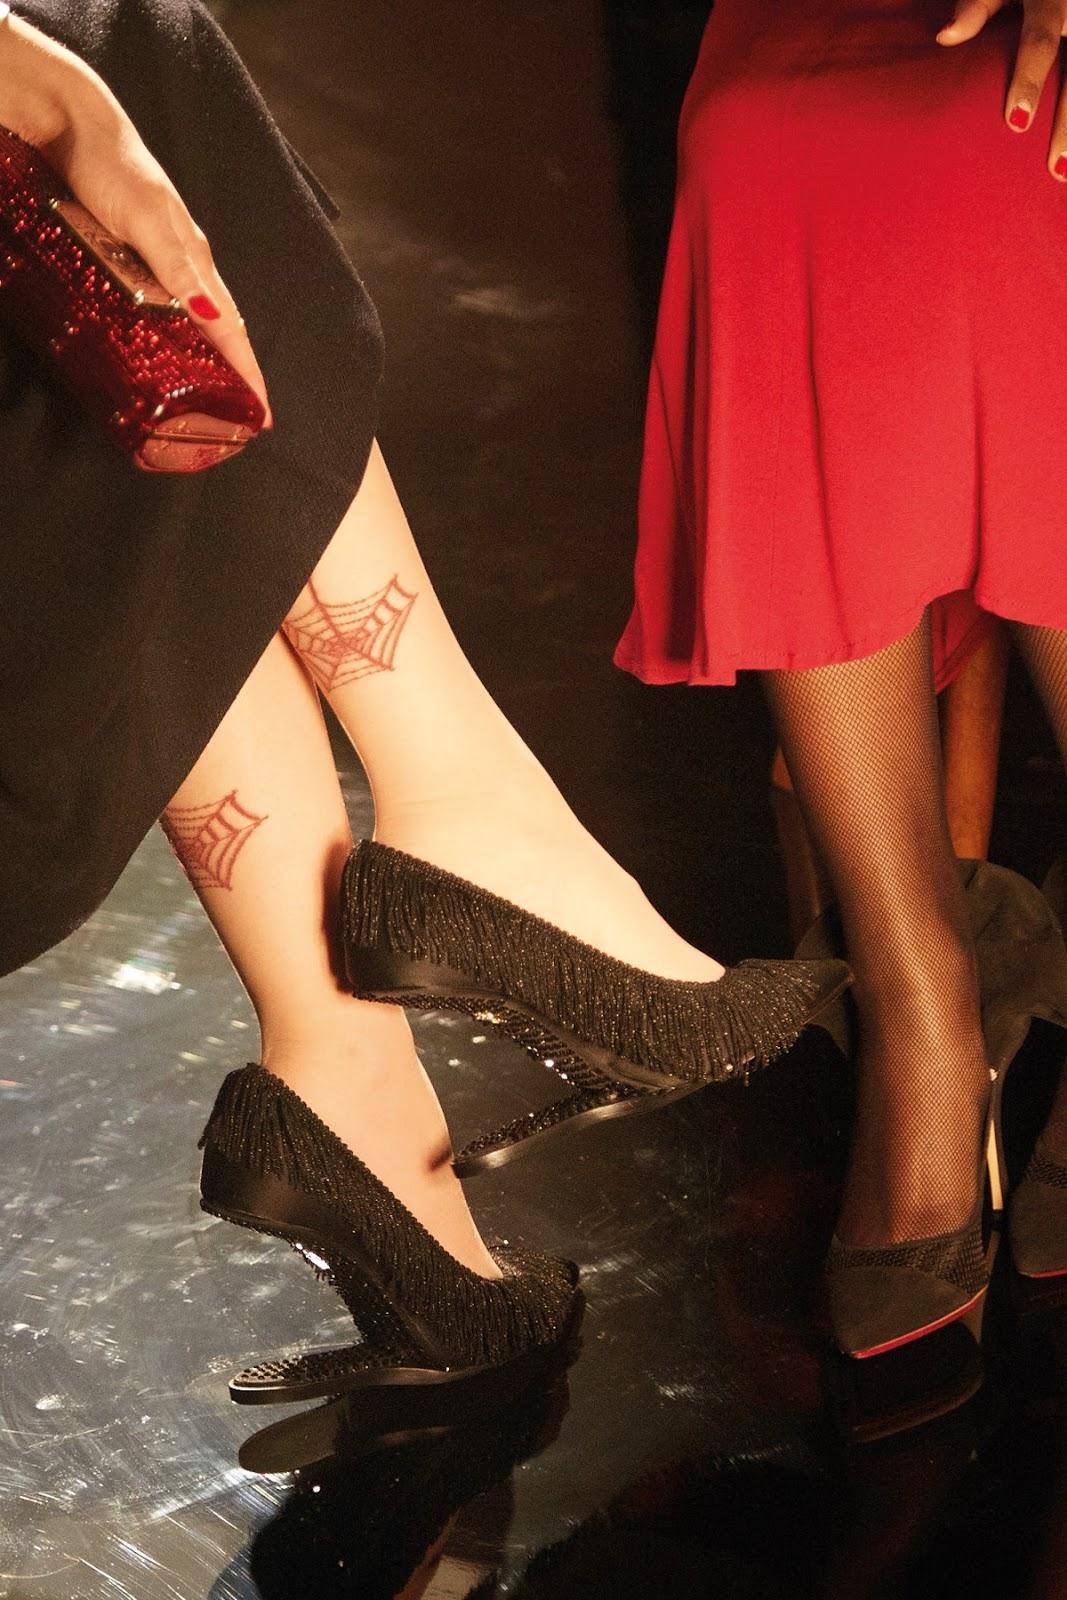 Charlotte Olympia Shoes - No heels heart